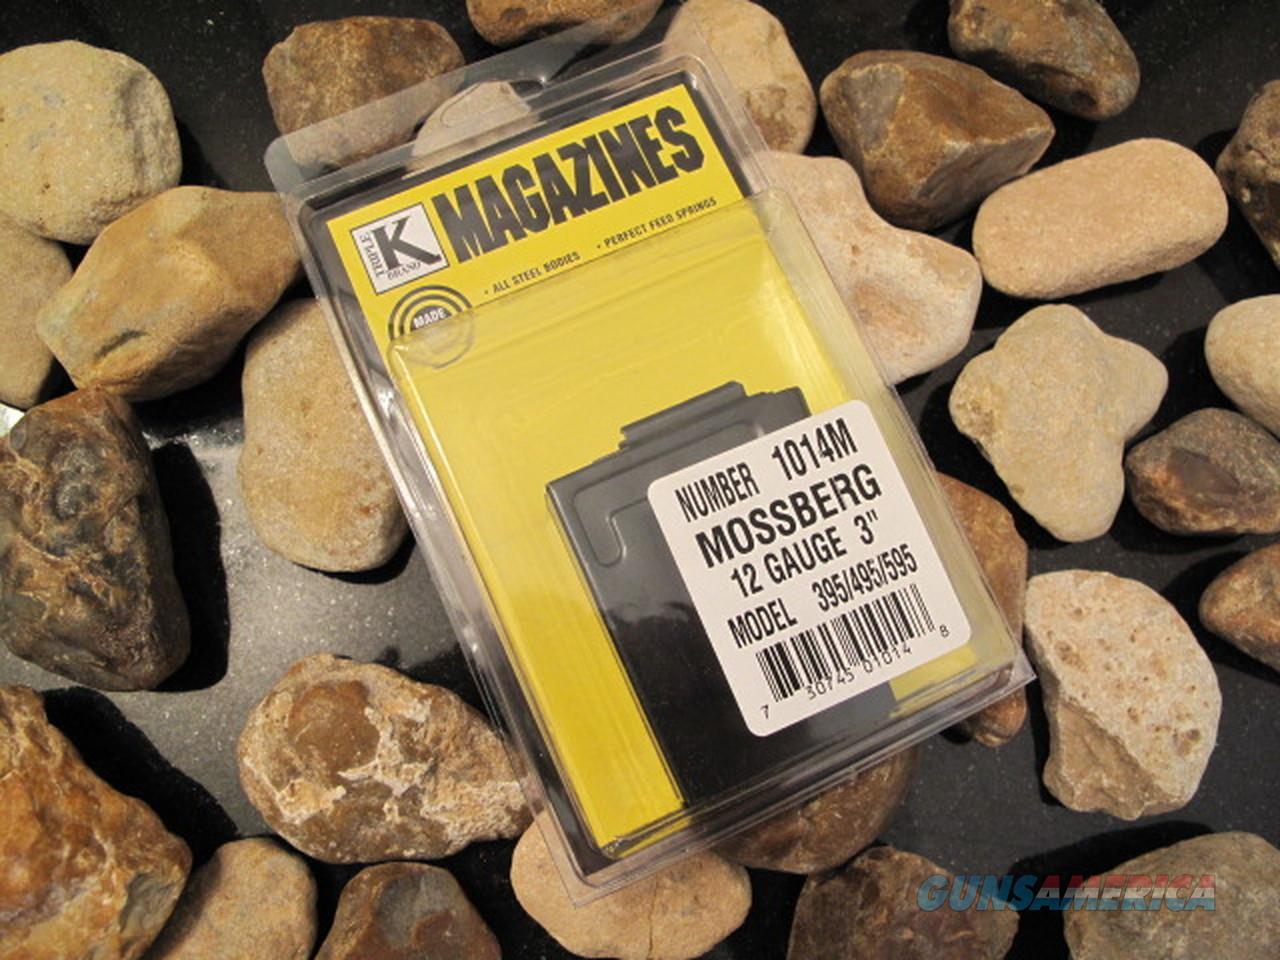 3-pack Magazine FITS Beretta Minx Model 950 .22 22 Short Mag Clip Mags USA MADE  Non-Guns > Ammunition